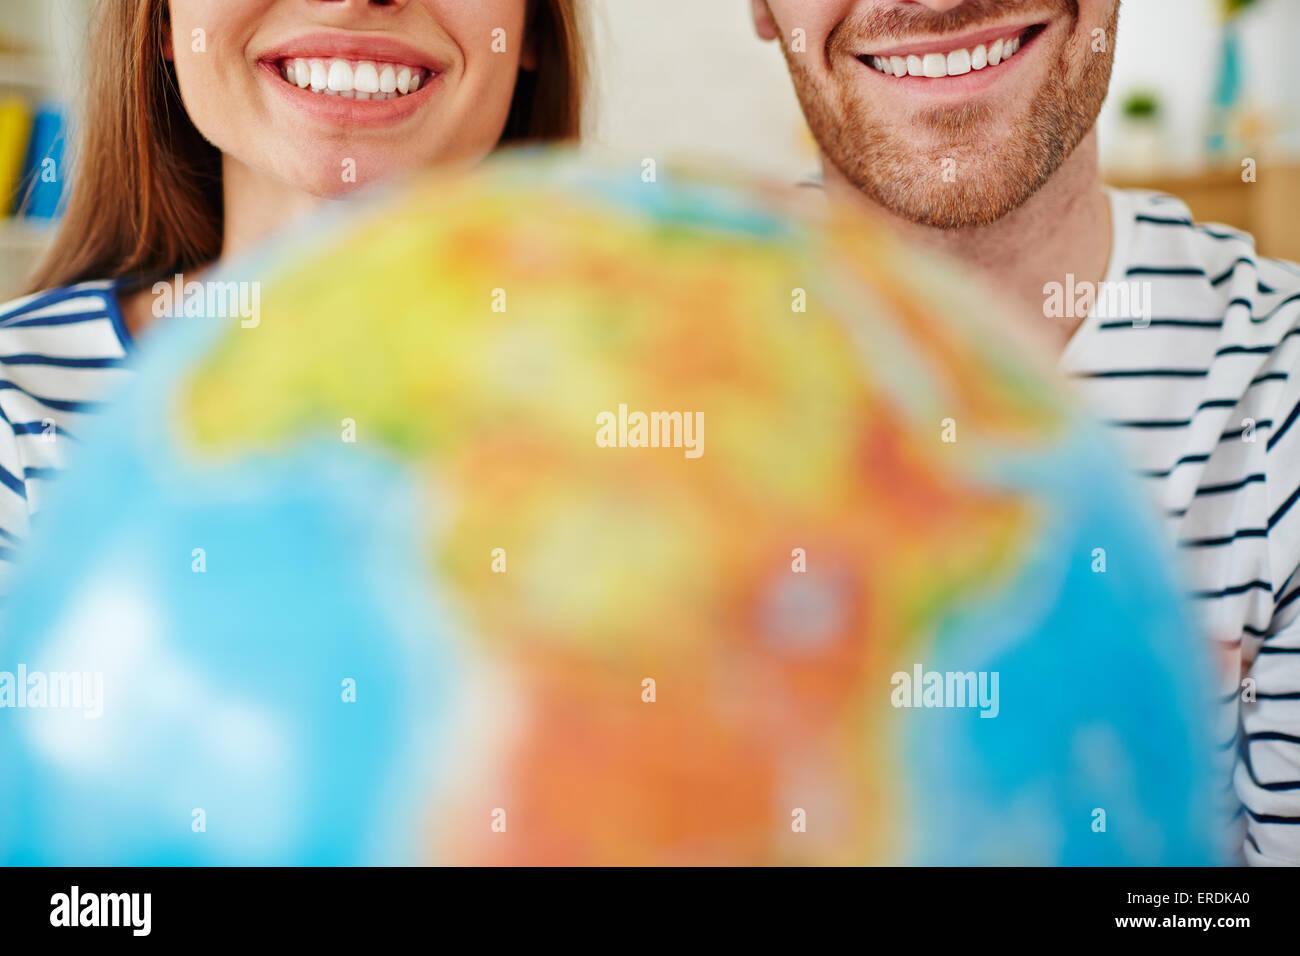 Date amorosa con toothy sorrisi e globe Immagini Stock